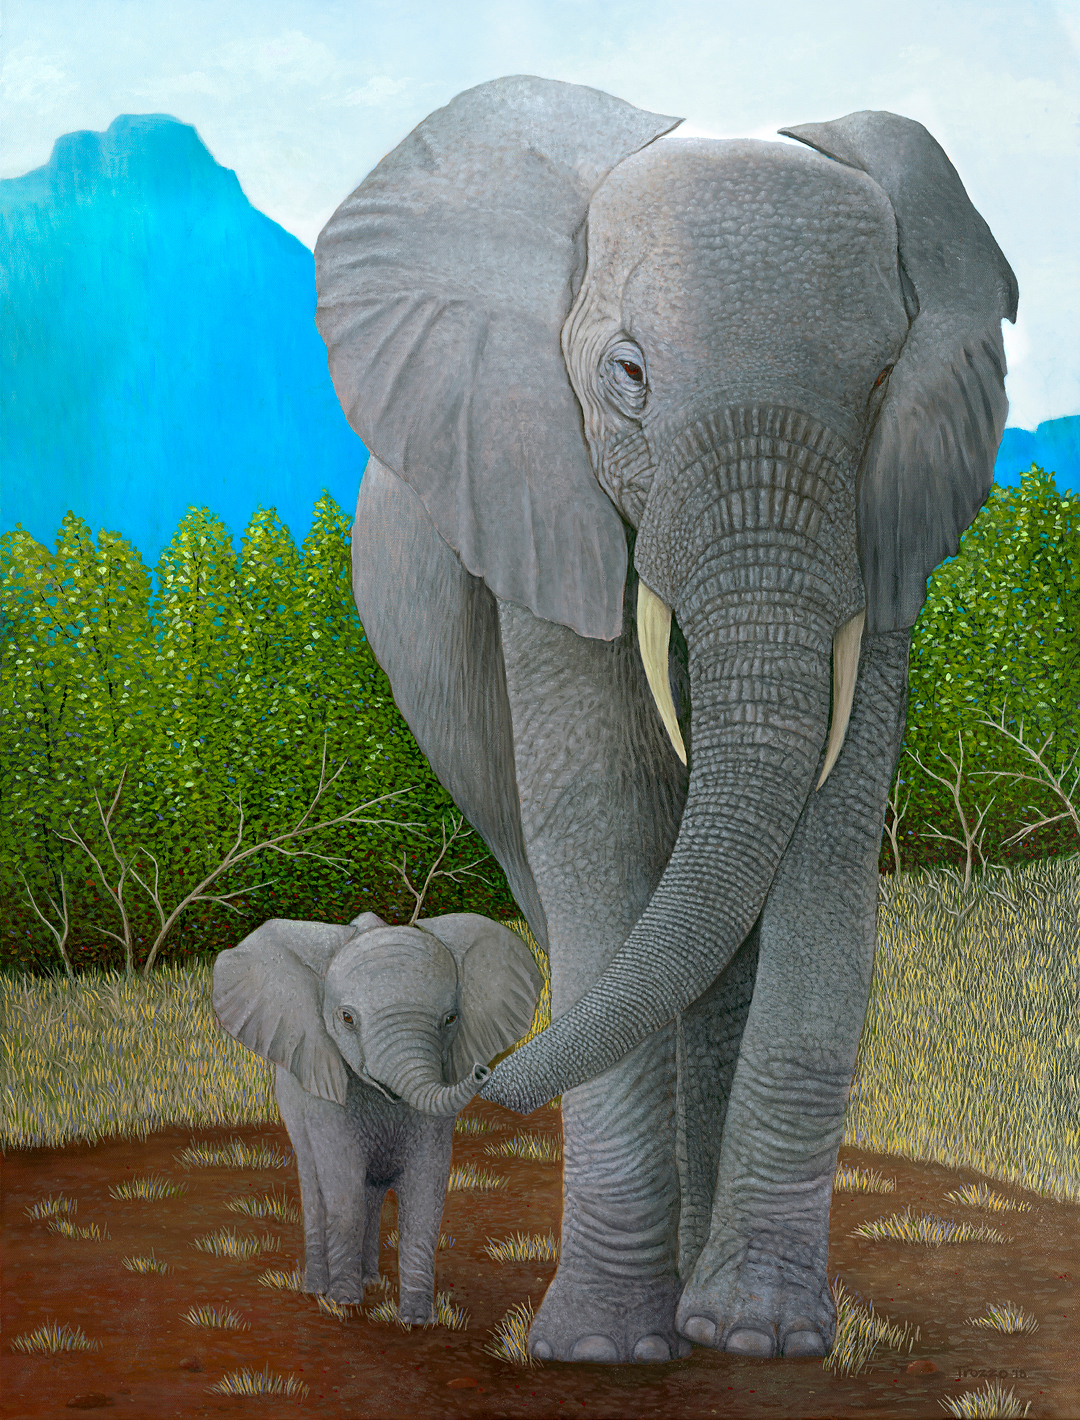 Elephants asf kk3hlm